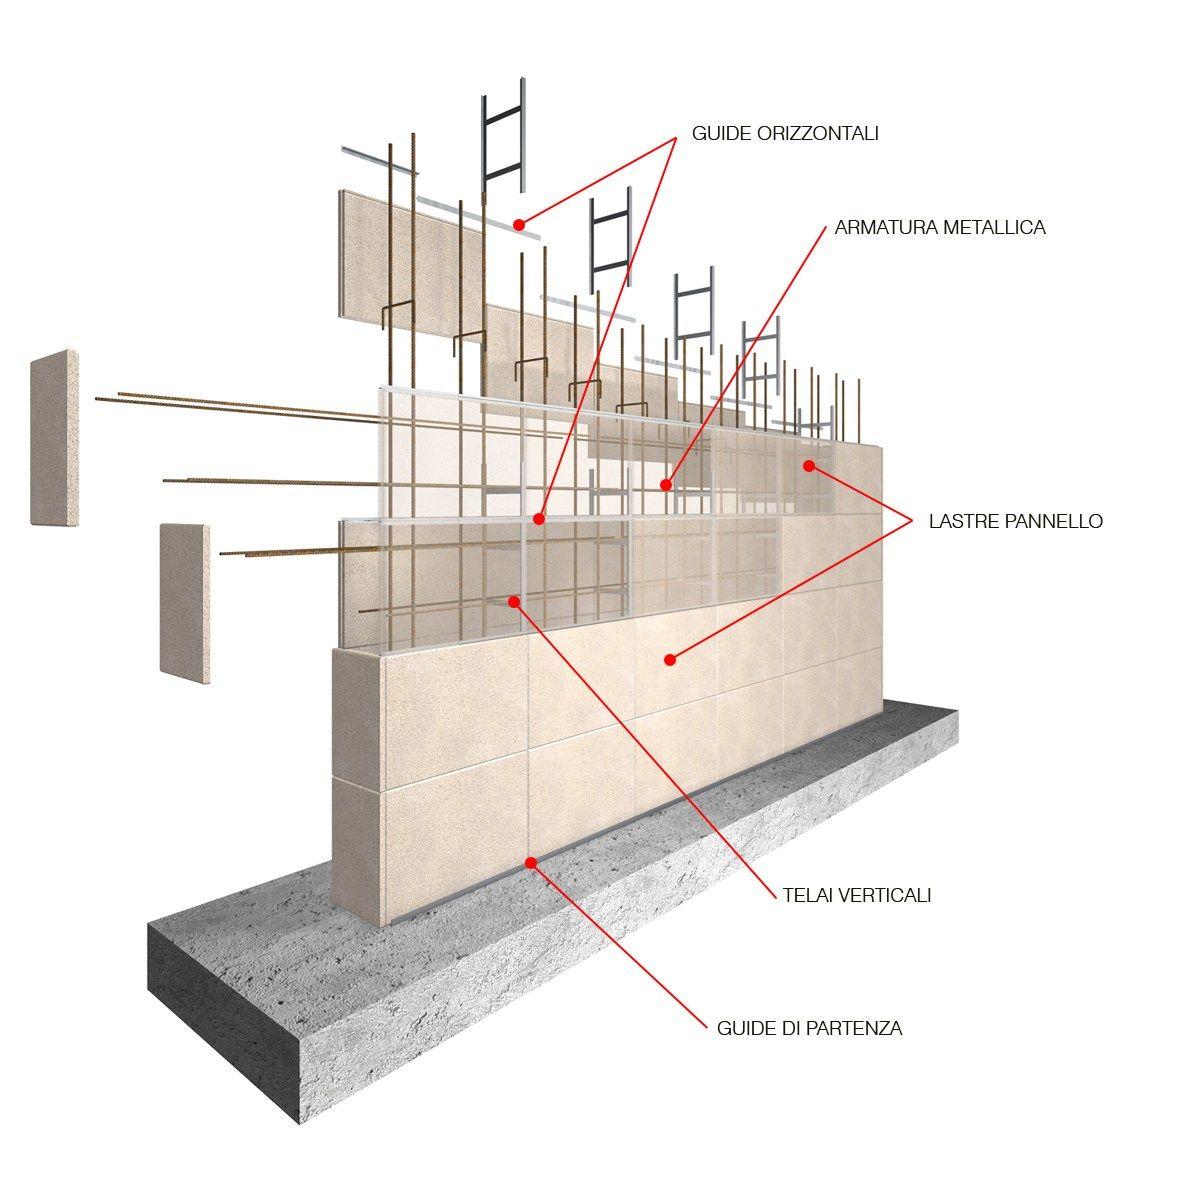 Formwork System For Concrete Walls Cassaforma Rivestimento